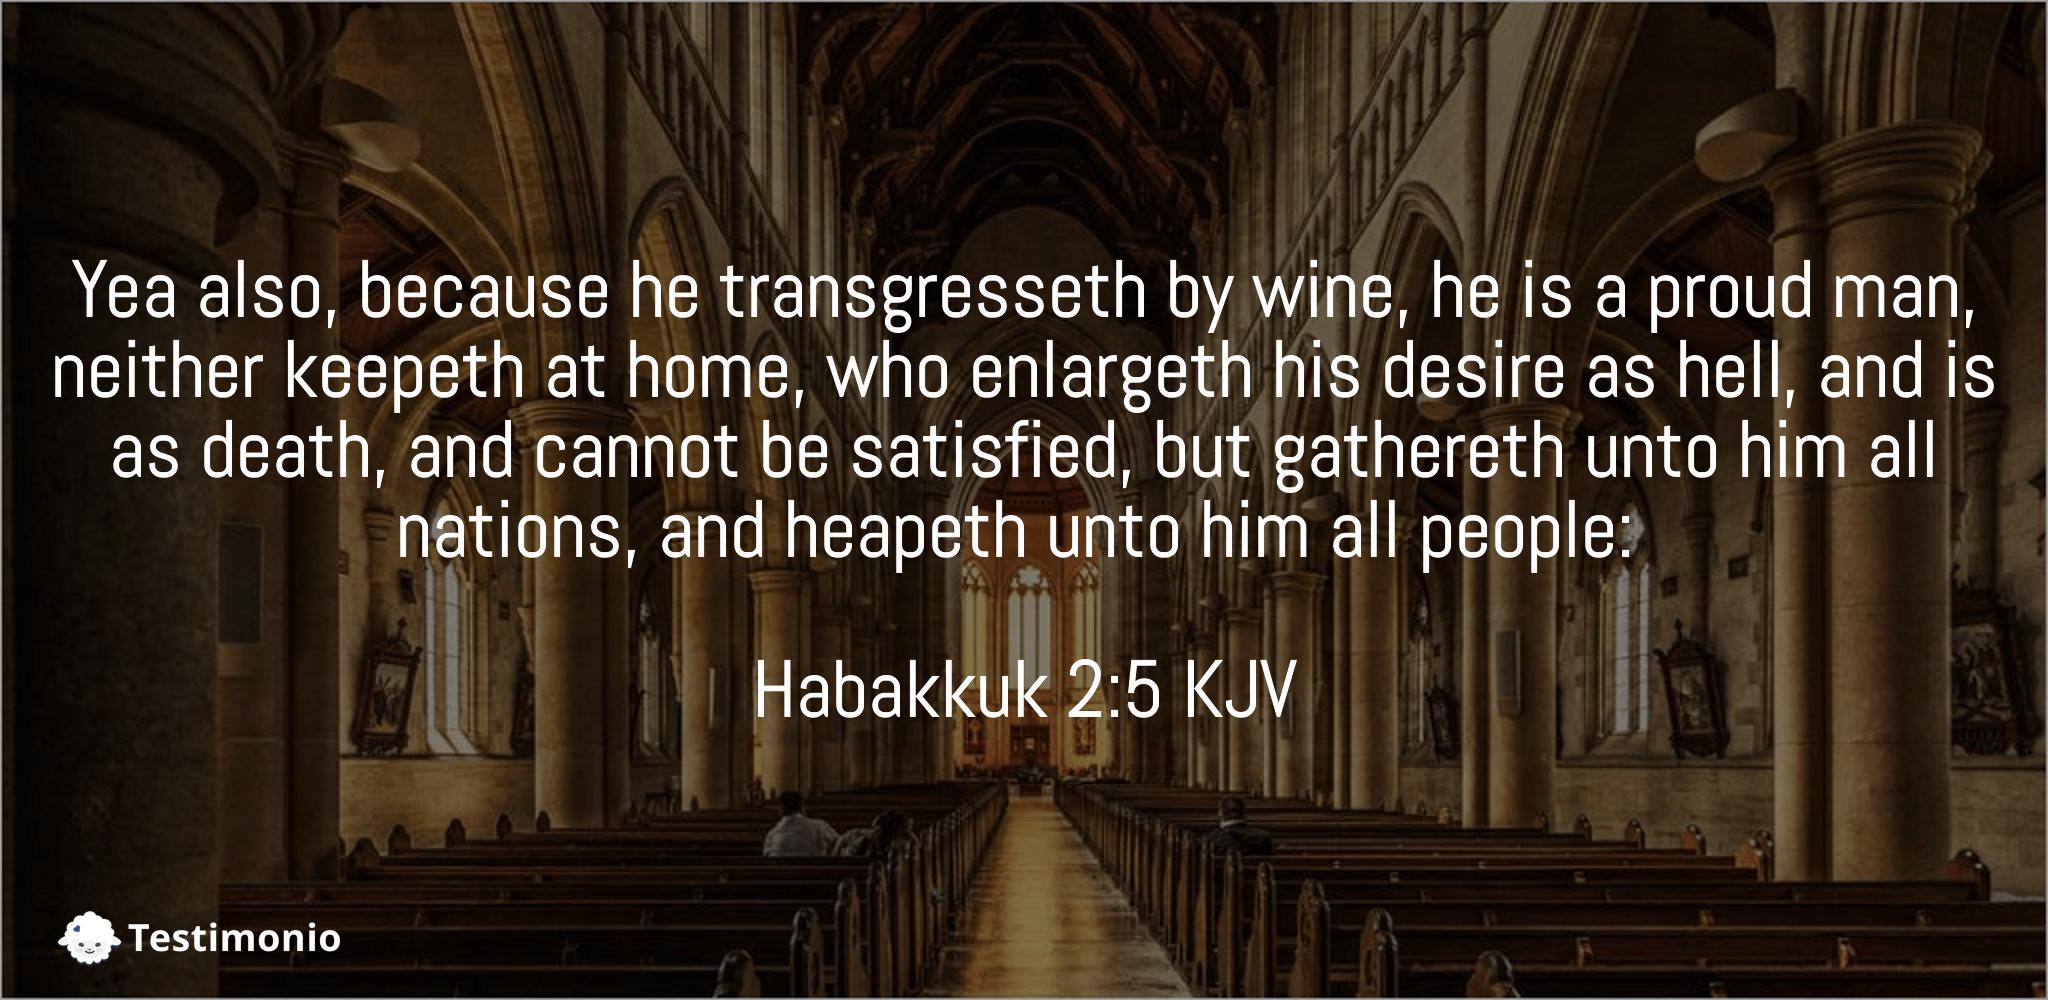 Habakkuk 2:5